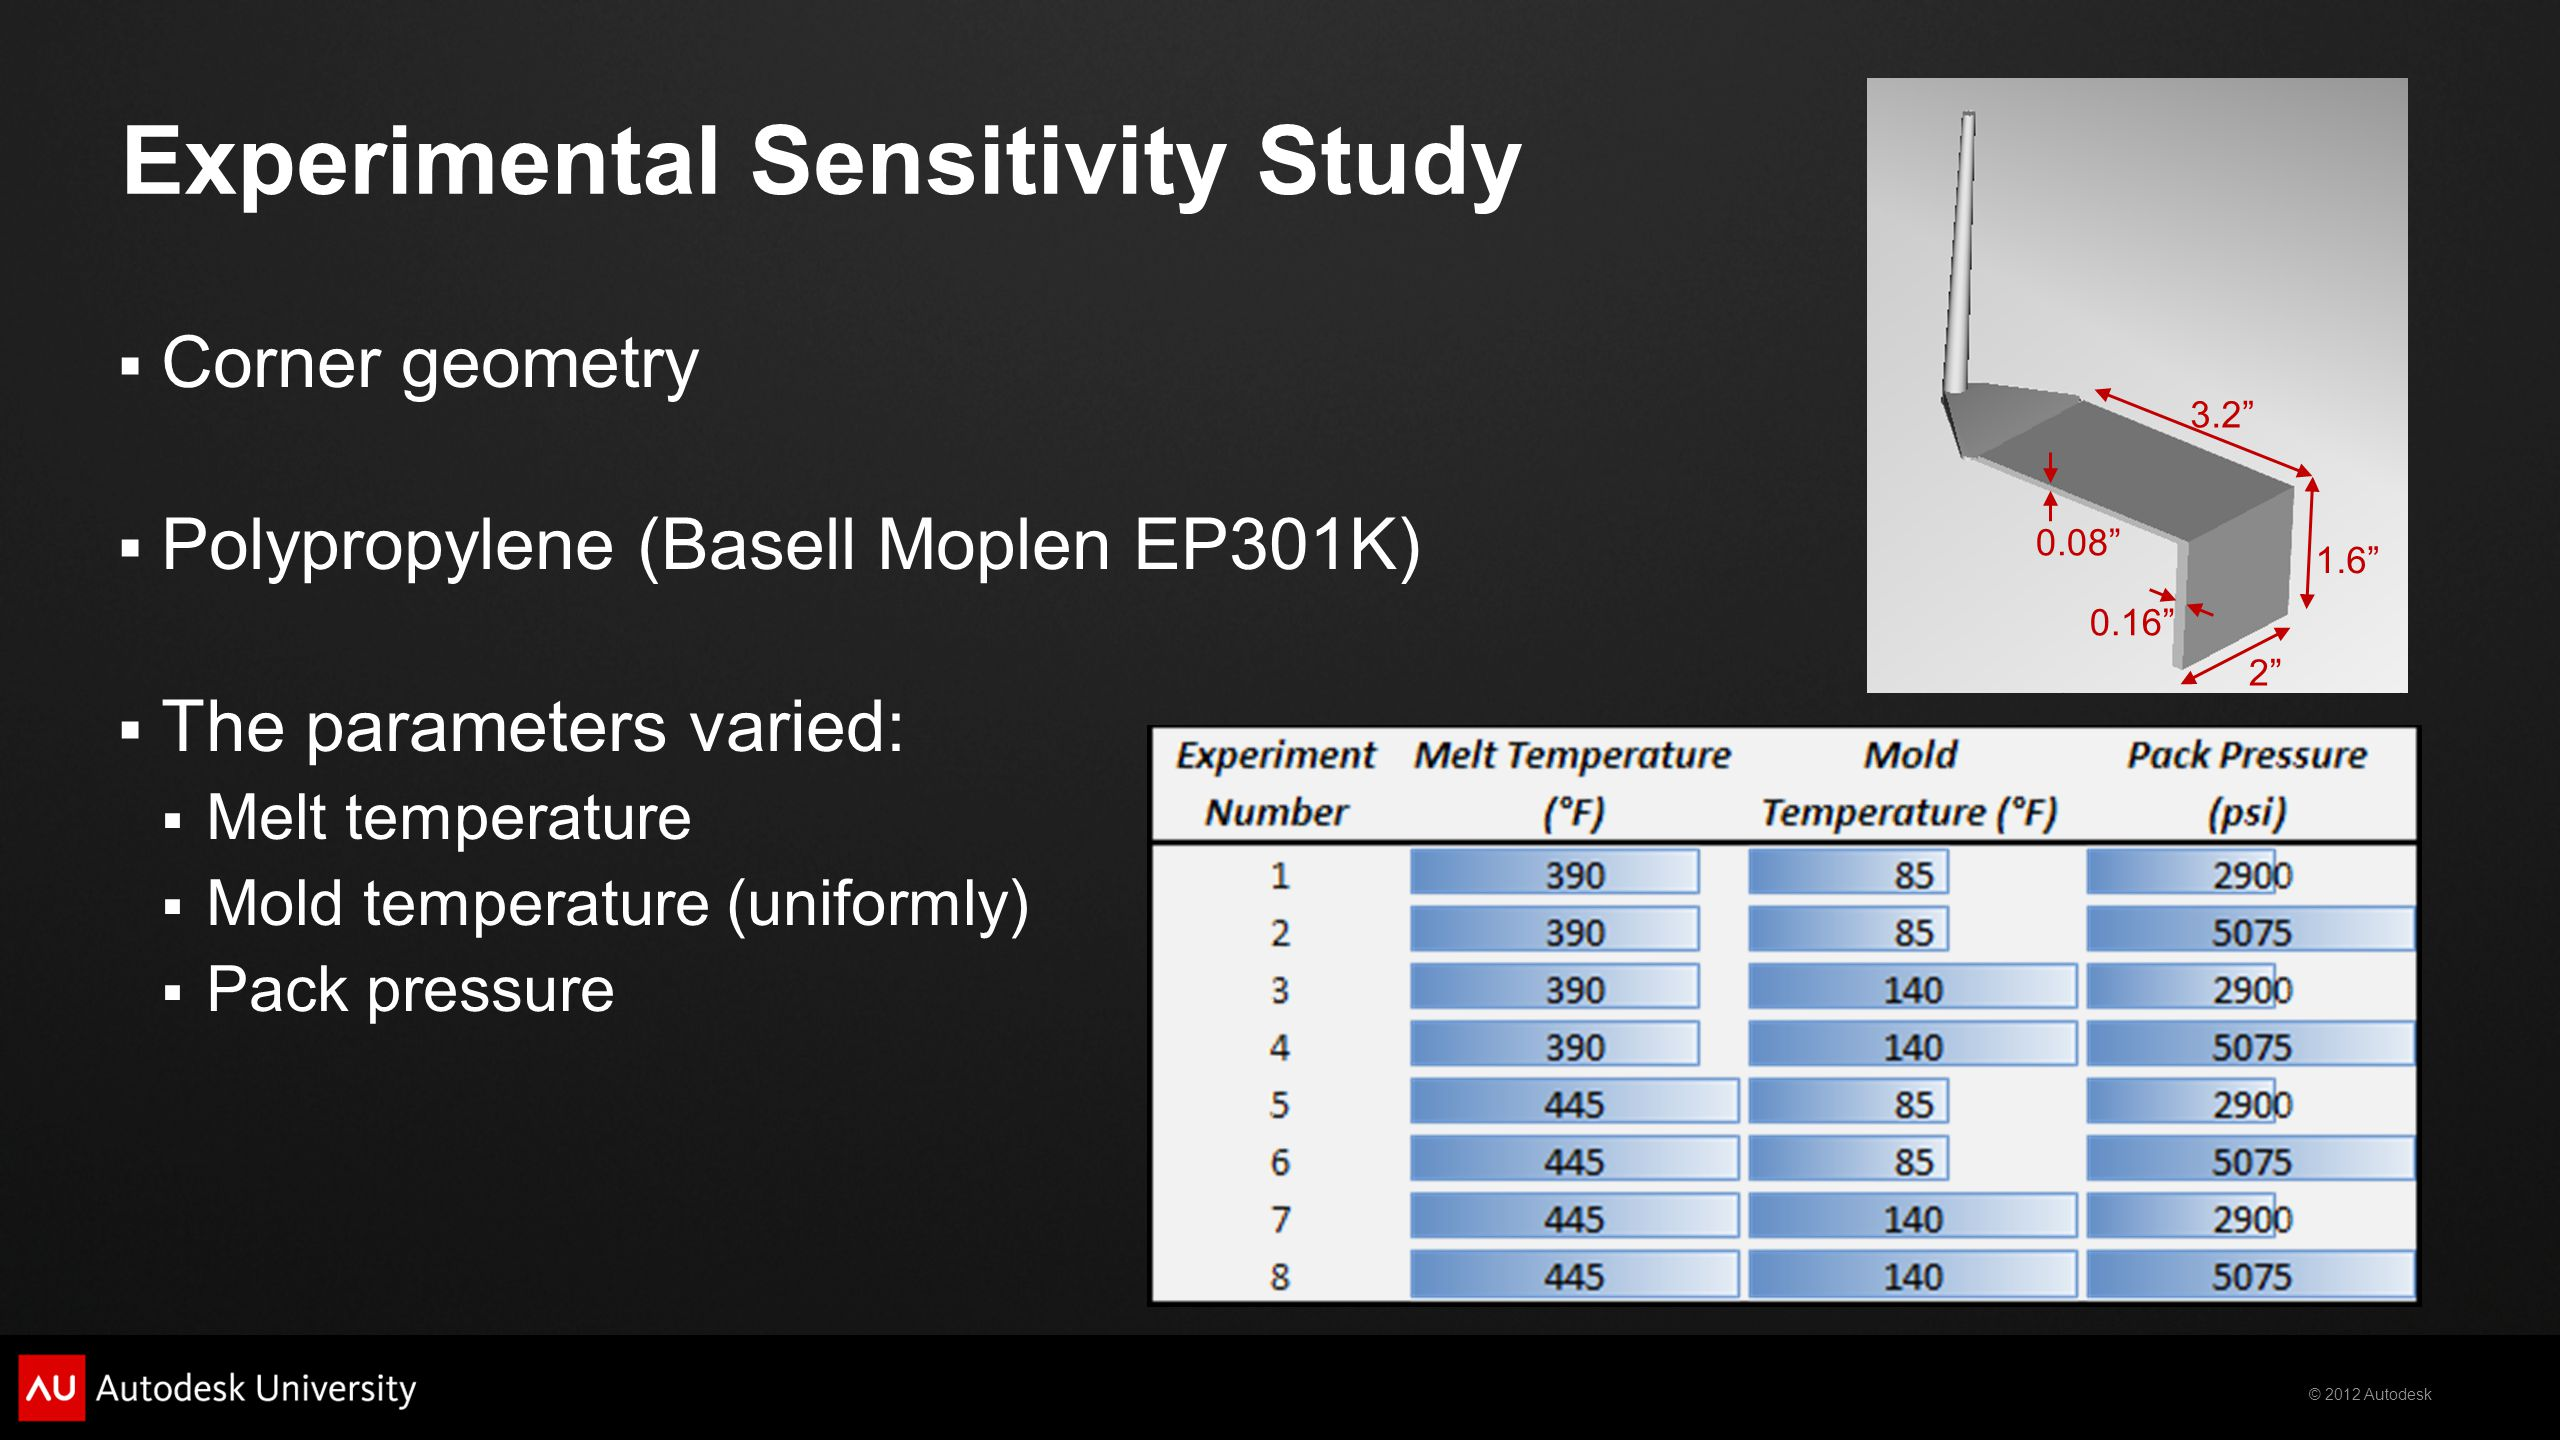 © 2012 Autodesk Experimental Sensitivity Study  Corner geometry  Polypropylene (Basell Moplen EP301K)  The parameters varied:  Melt temperature 